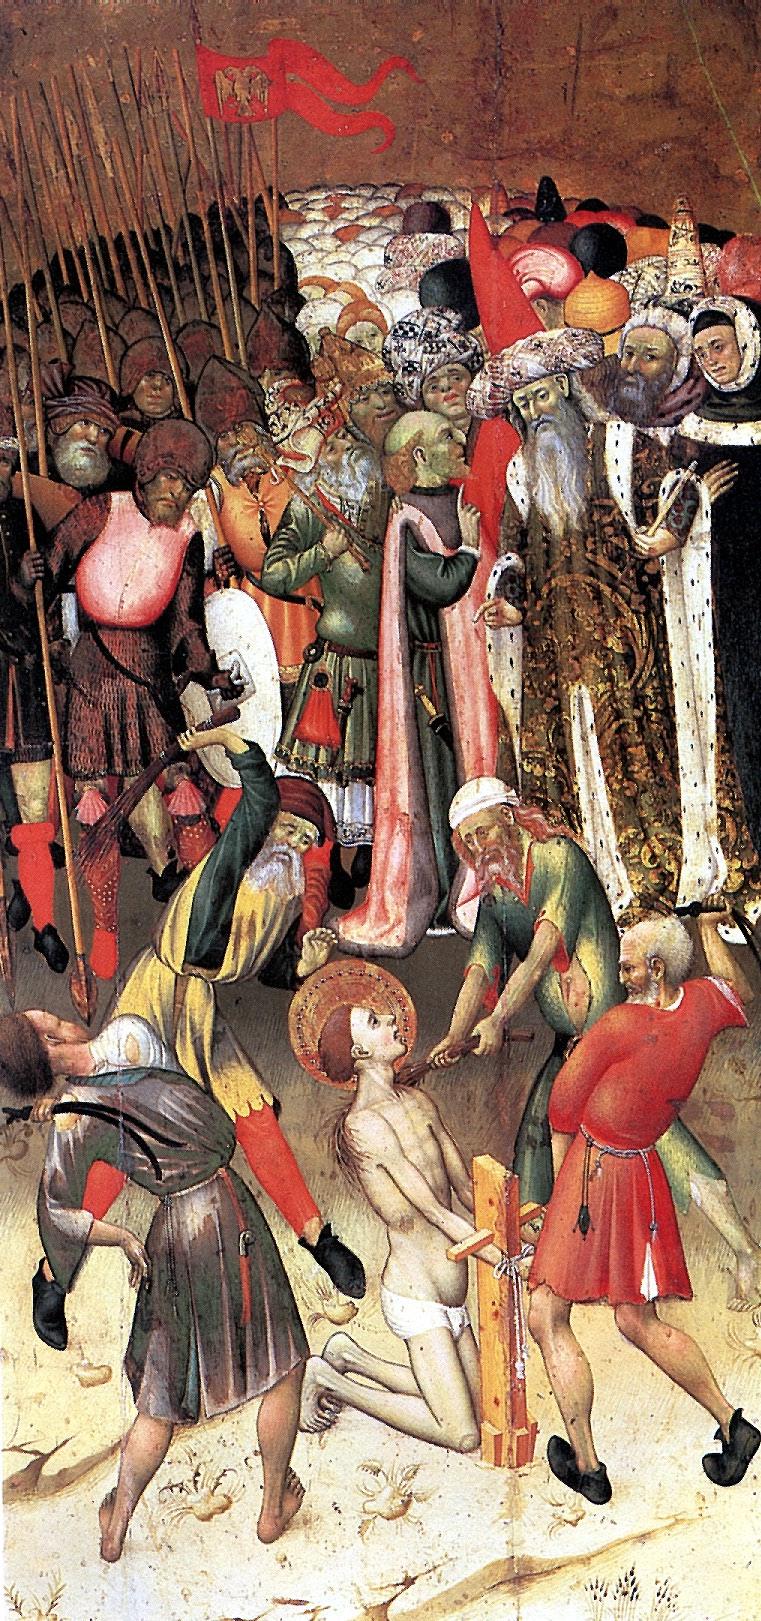 Bernat Martorell. Scene of the martyrdom of St. George